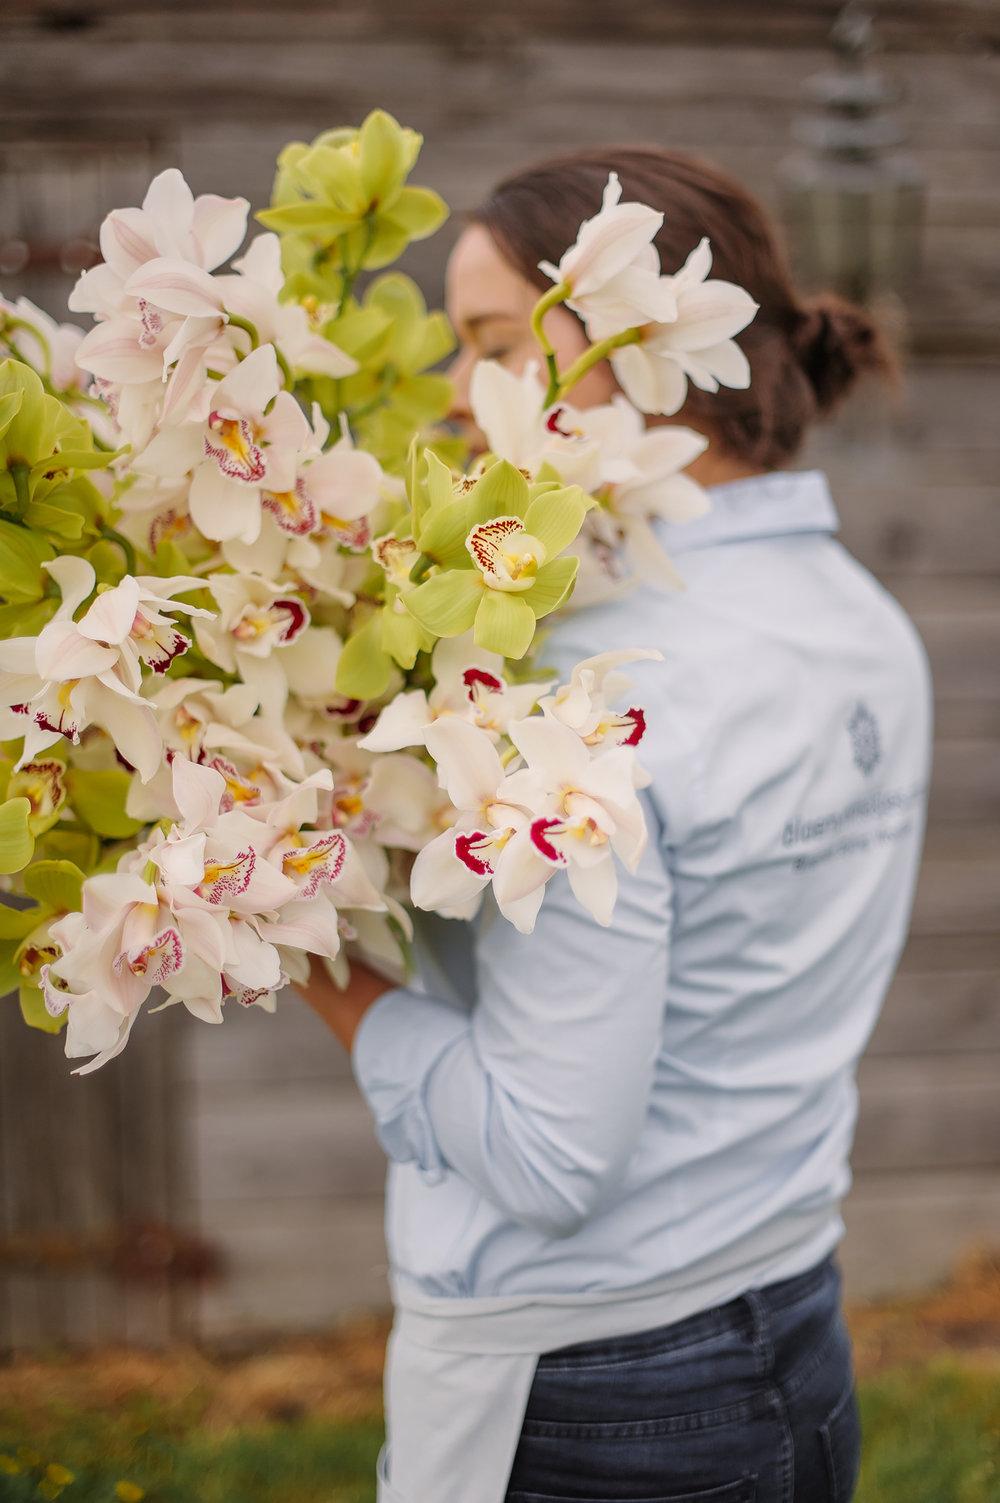 Schitterende Cymbidium orchideeën - perfect voor jullie bruiloft.